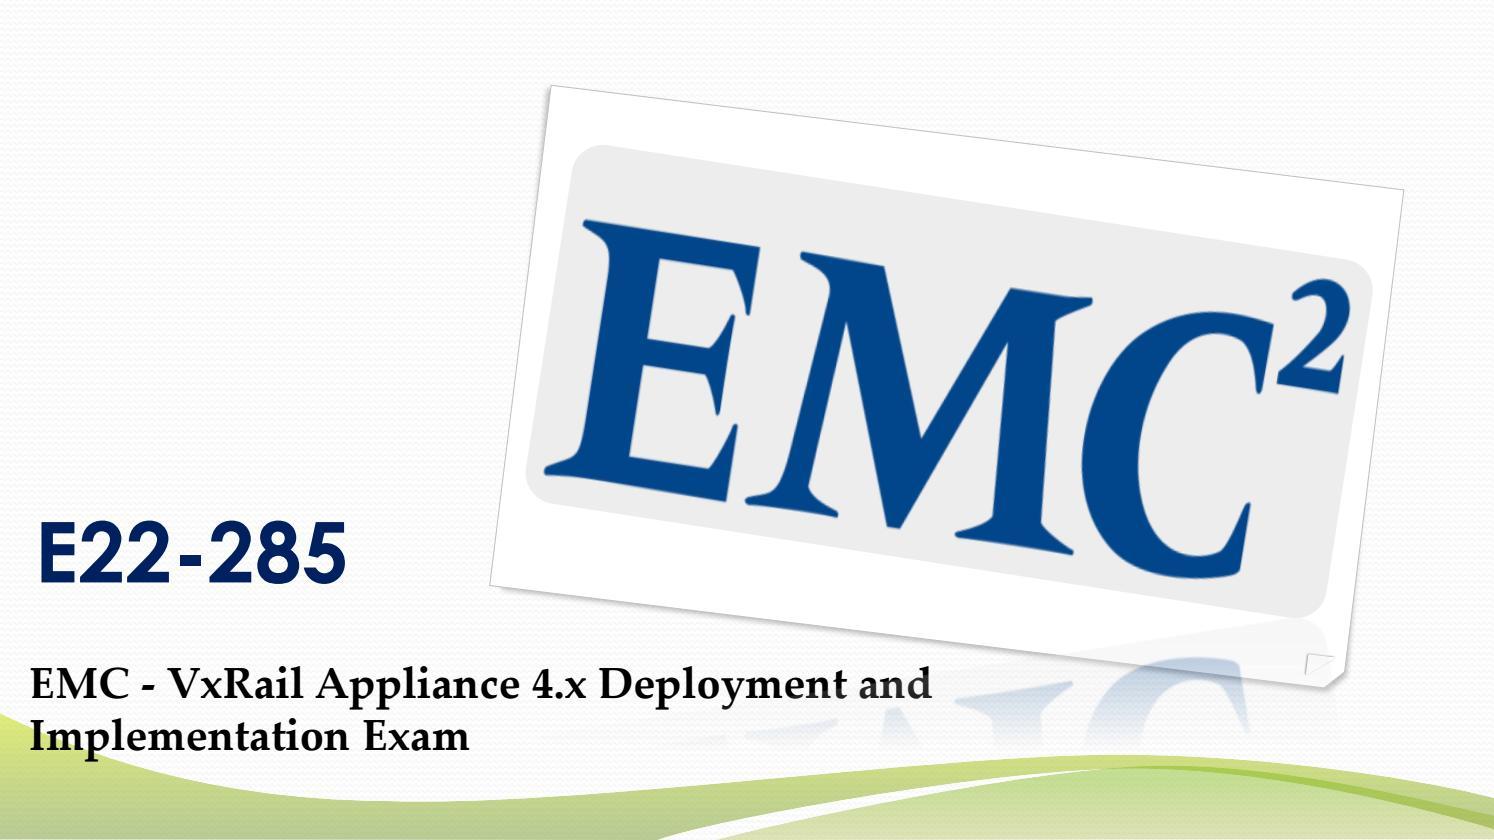 New EMC E22-285 Braindumps Questions by archeradam1 - issuu